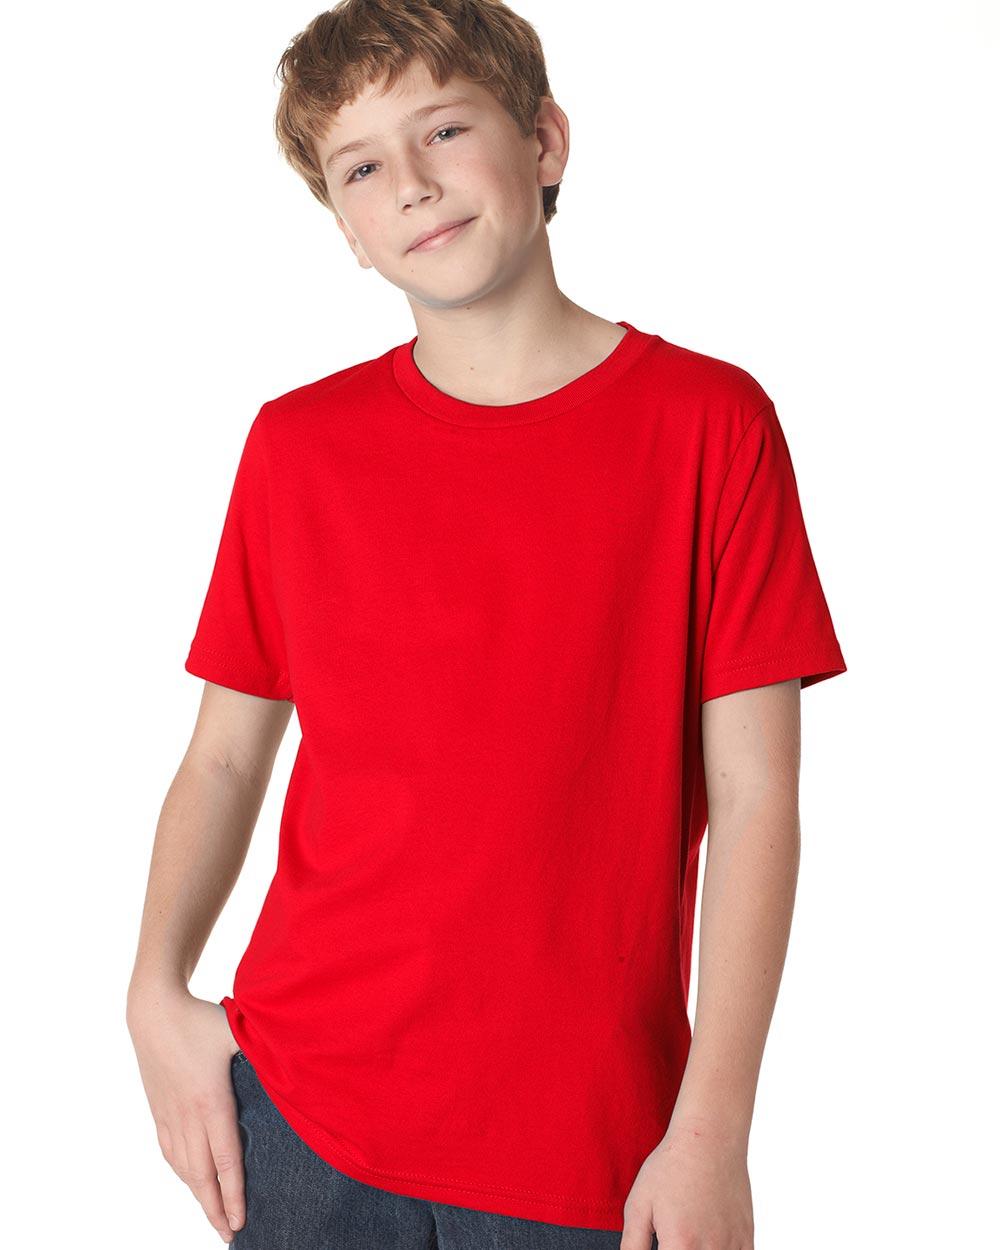 Next Level 3310 - Youth Cotton Crew T-Shirt